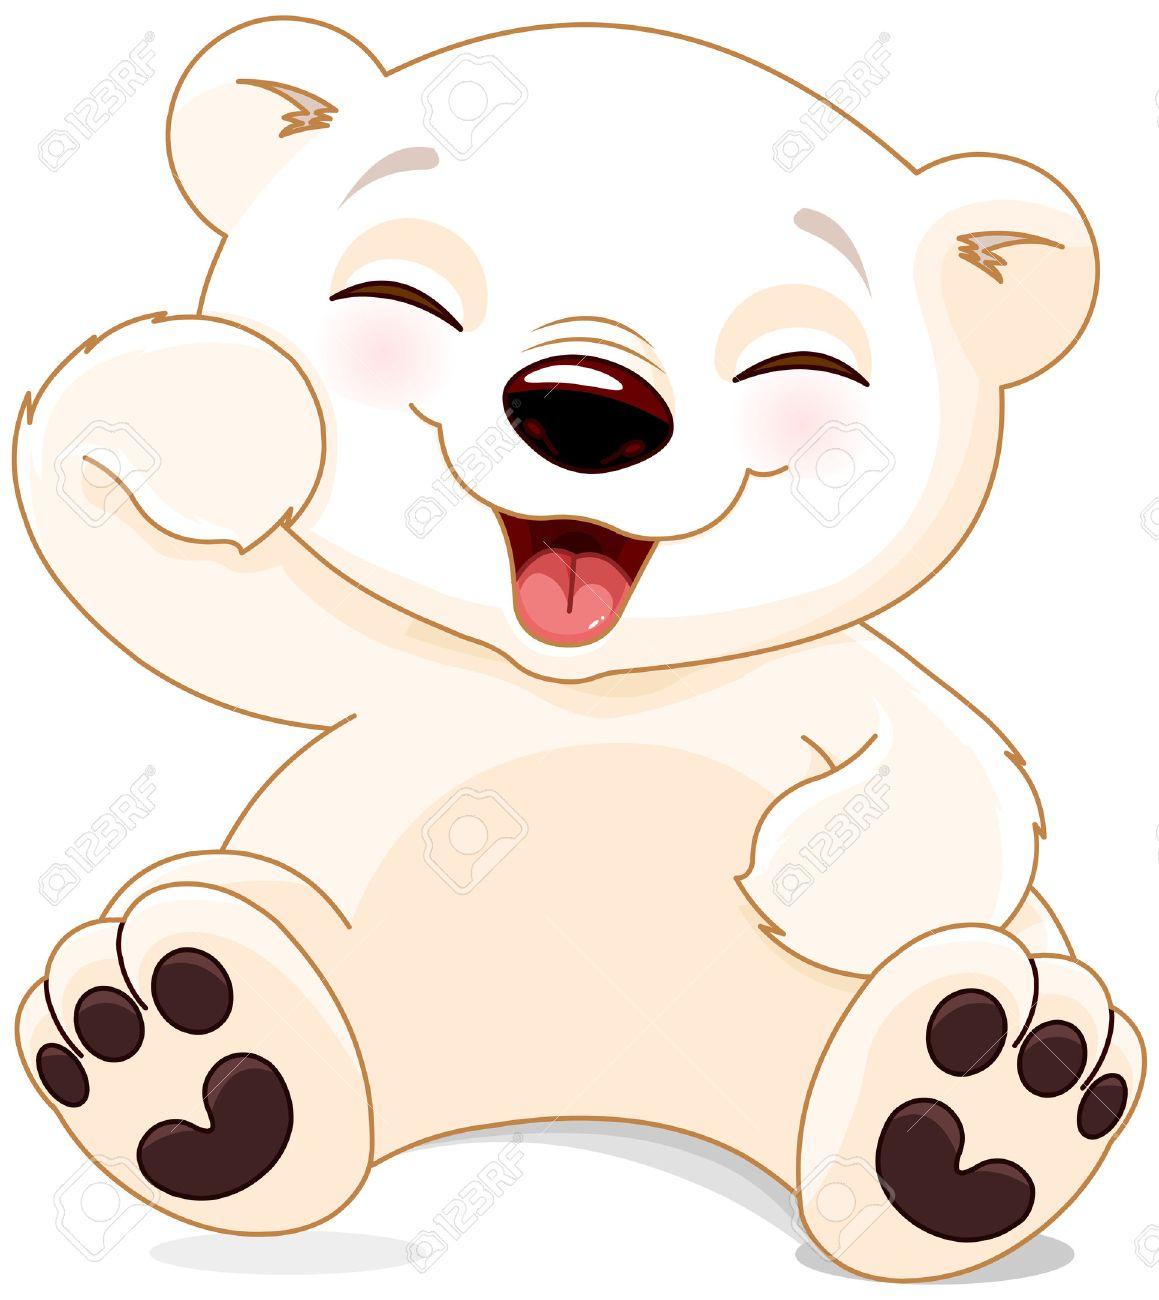 1159x1300 Cute Polar Bear Drawing Illustration Of Cute Polar Bear Is